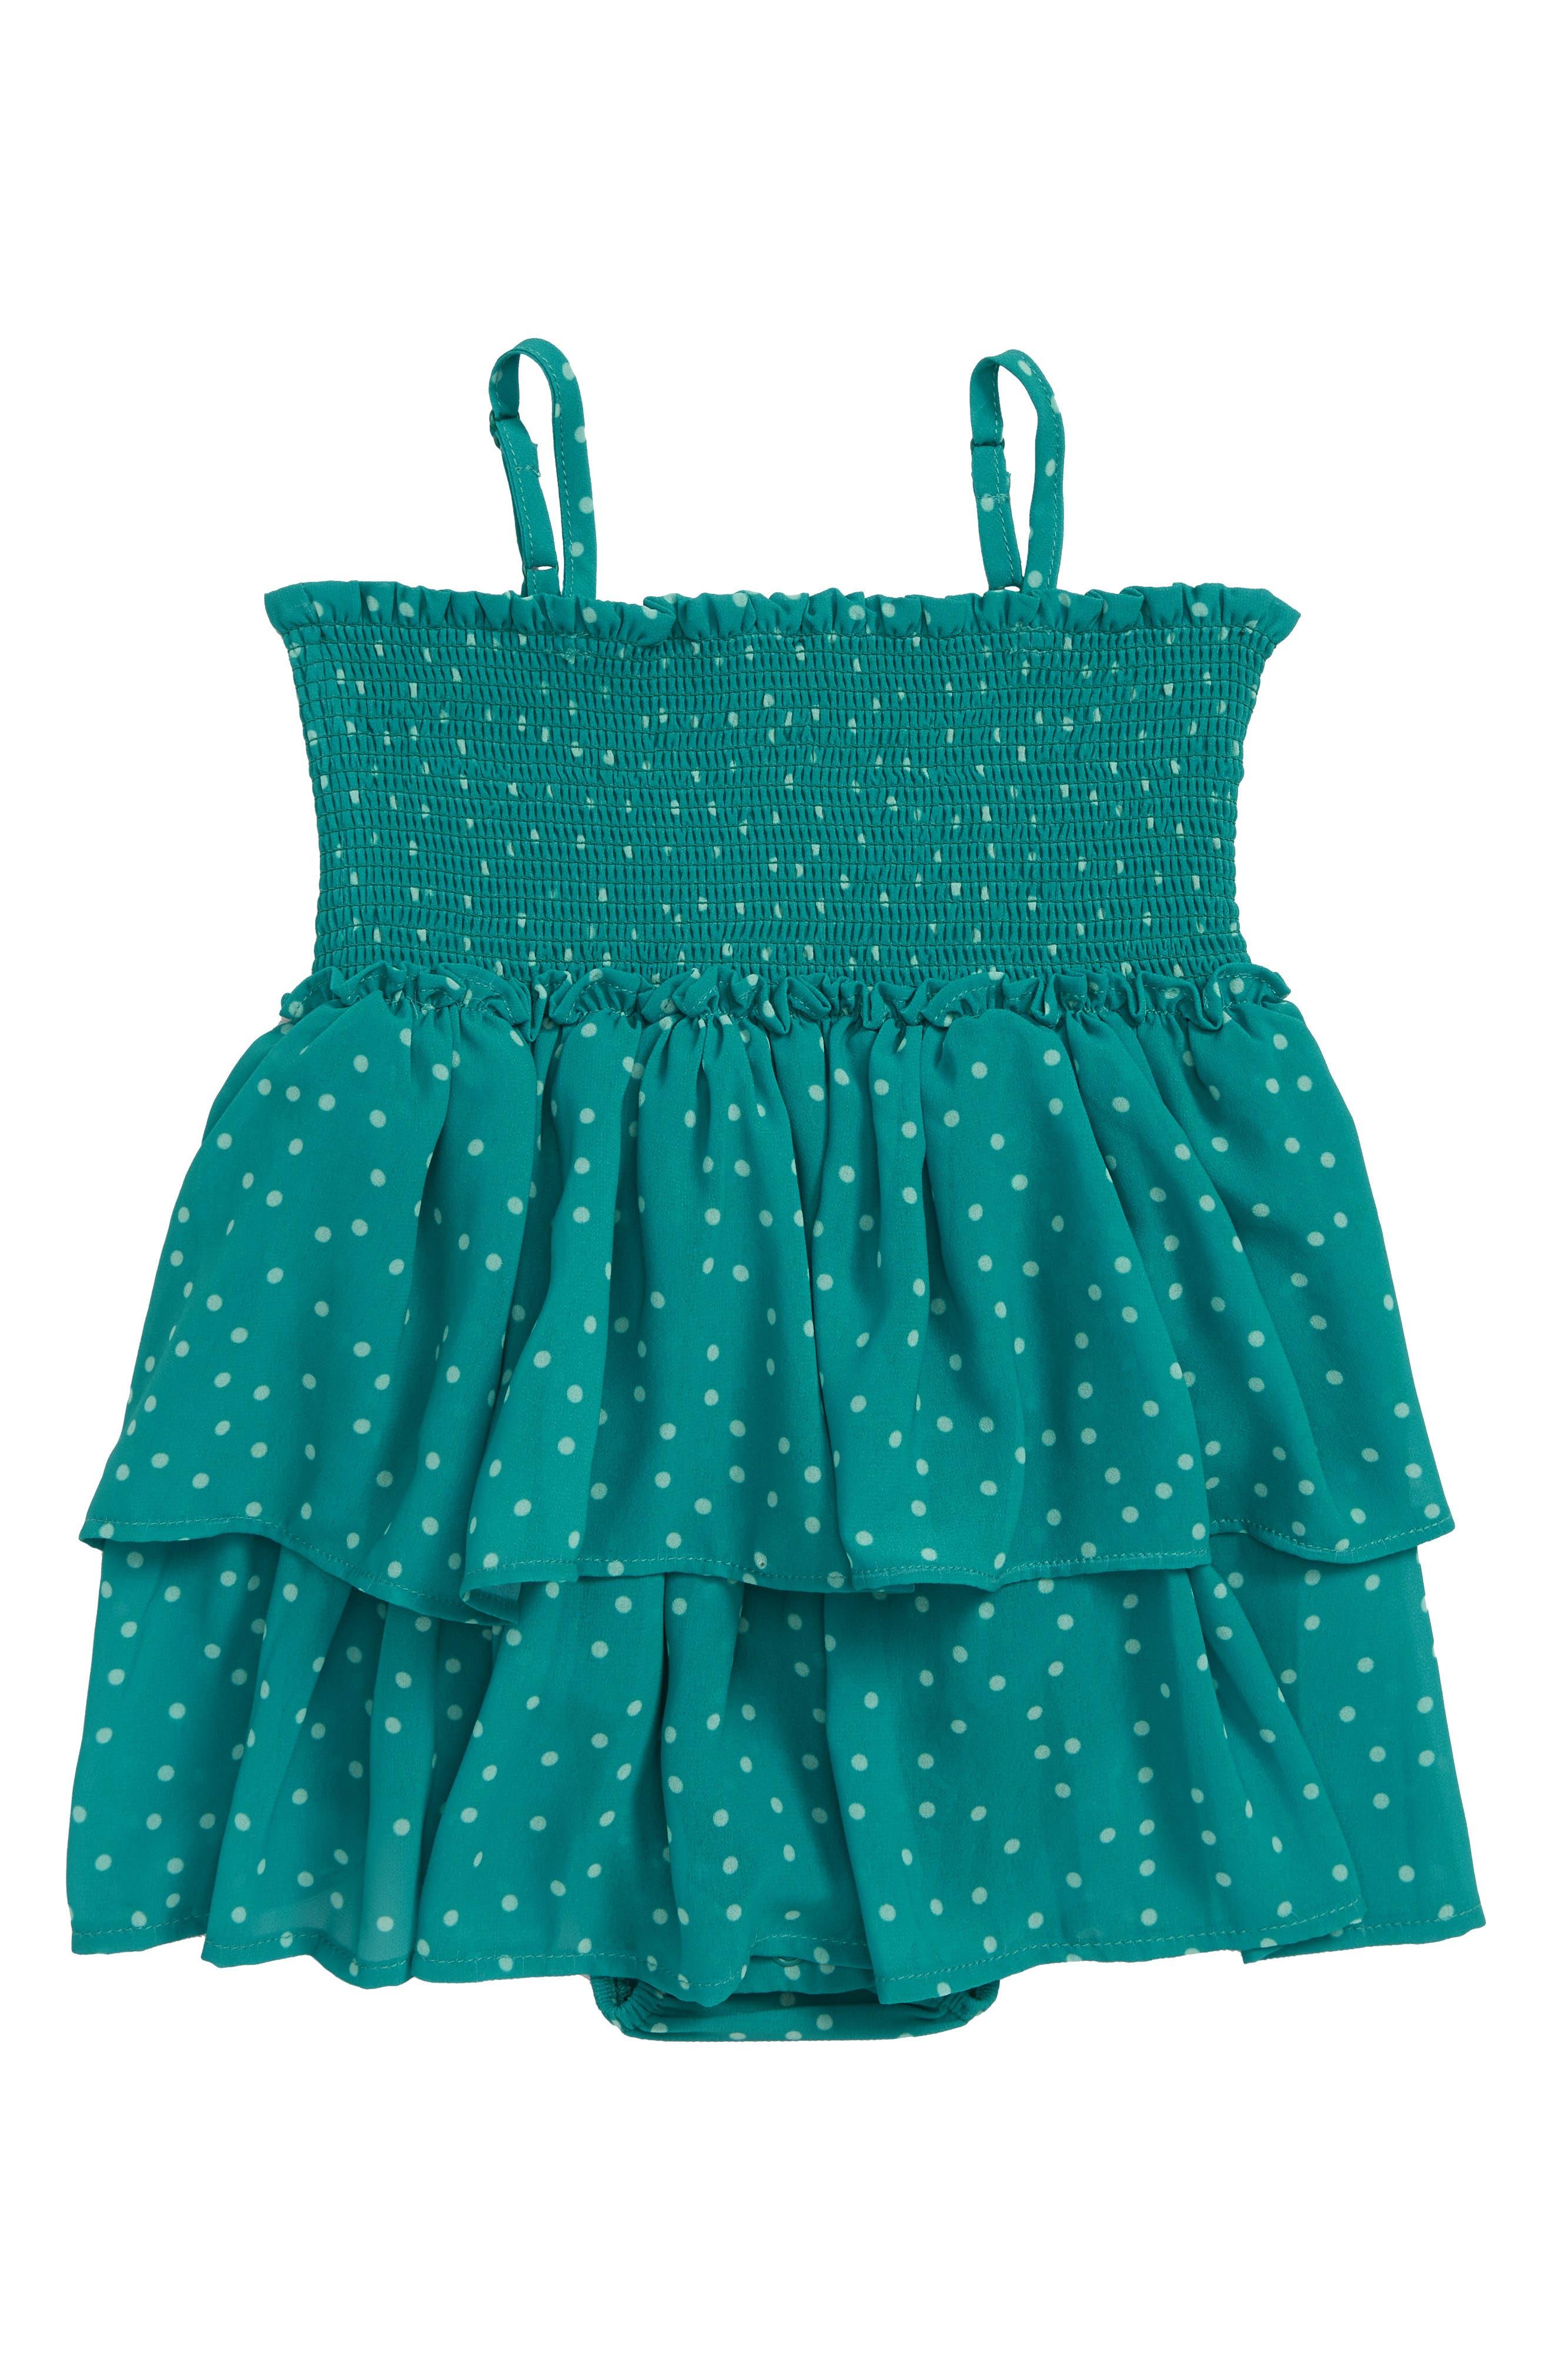 Stace Smocked Polka Dot Dress,                             Main thumbnail 1, color,                             Green/ White Spot